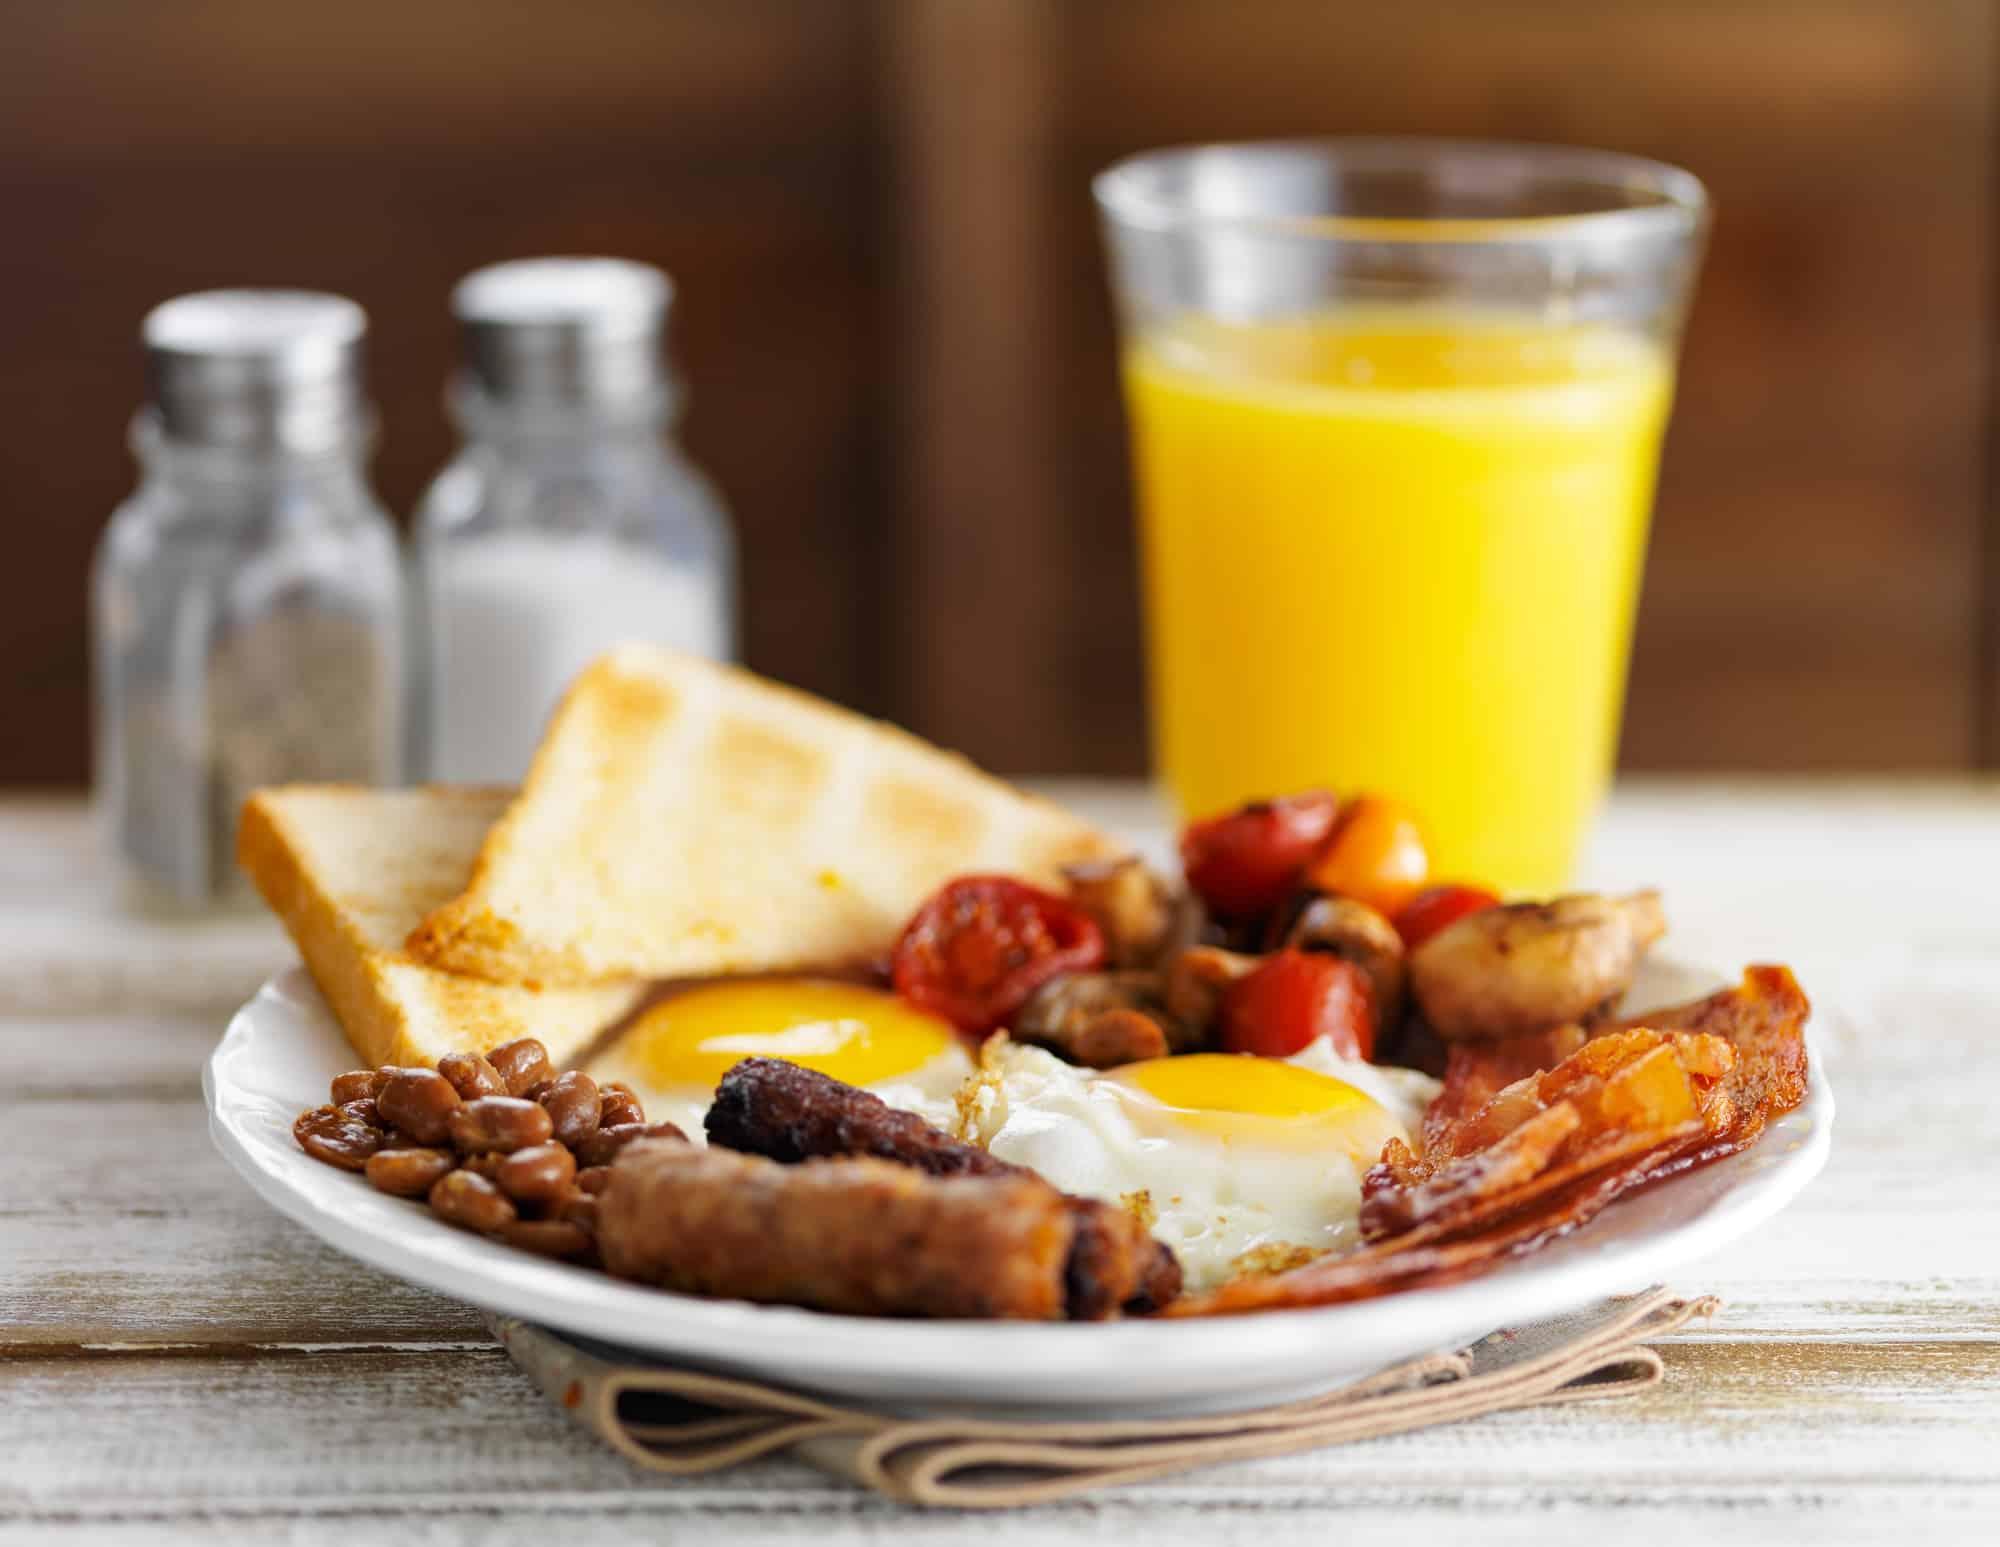 health benefits of skipping breakfast